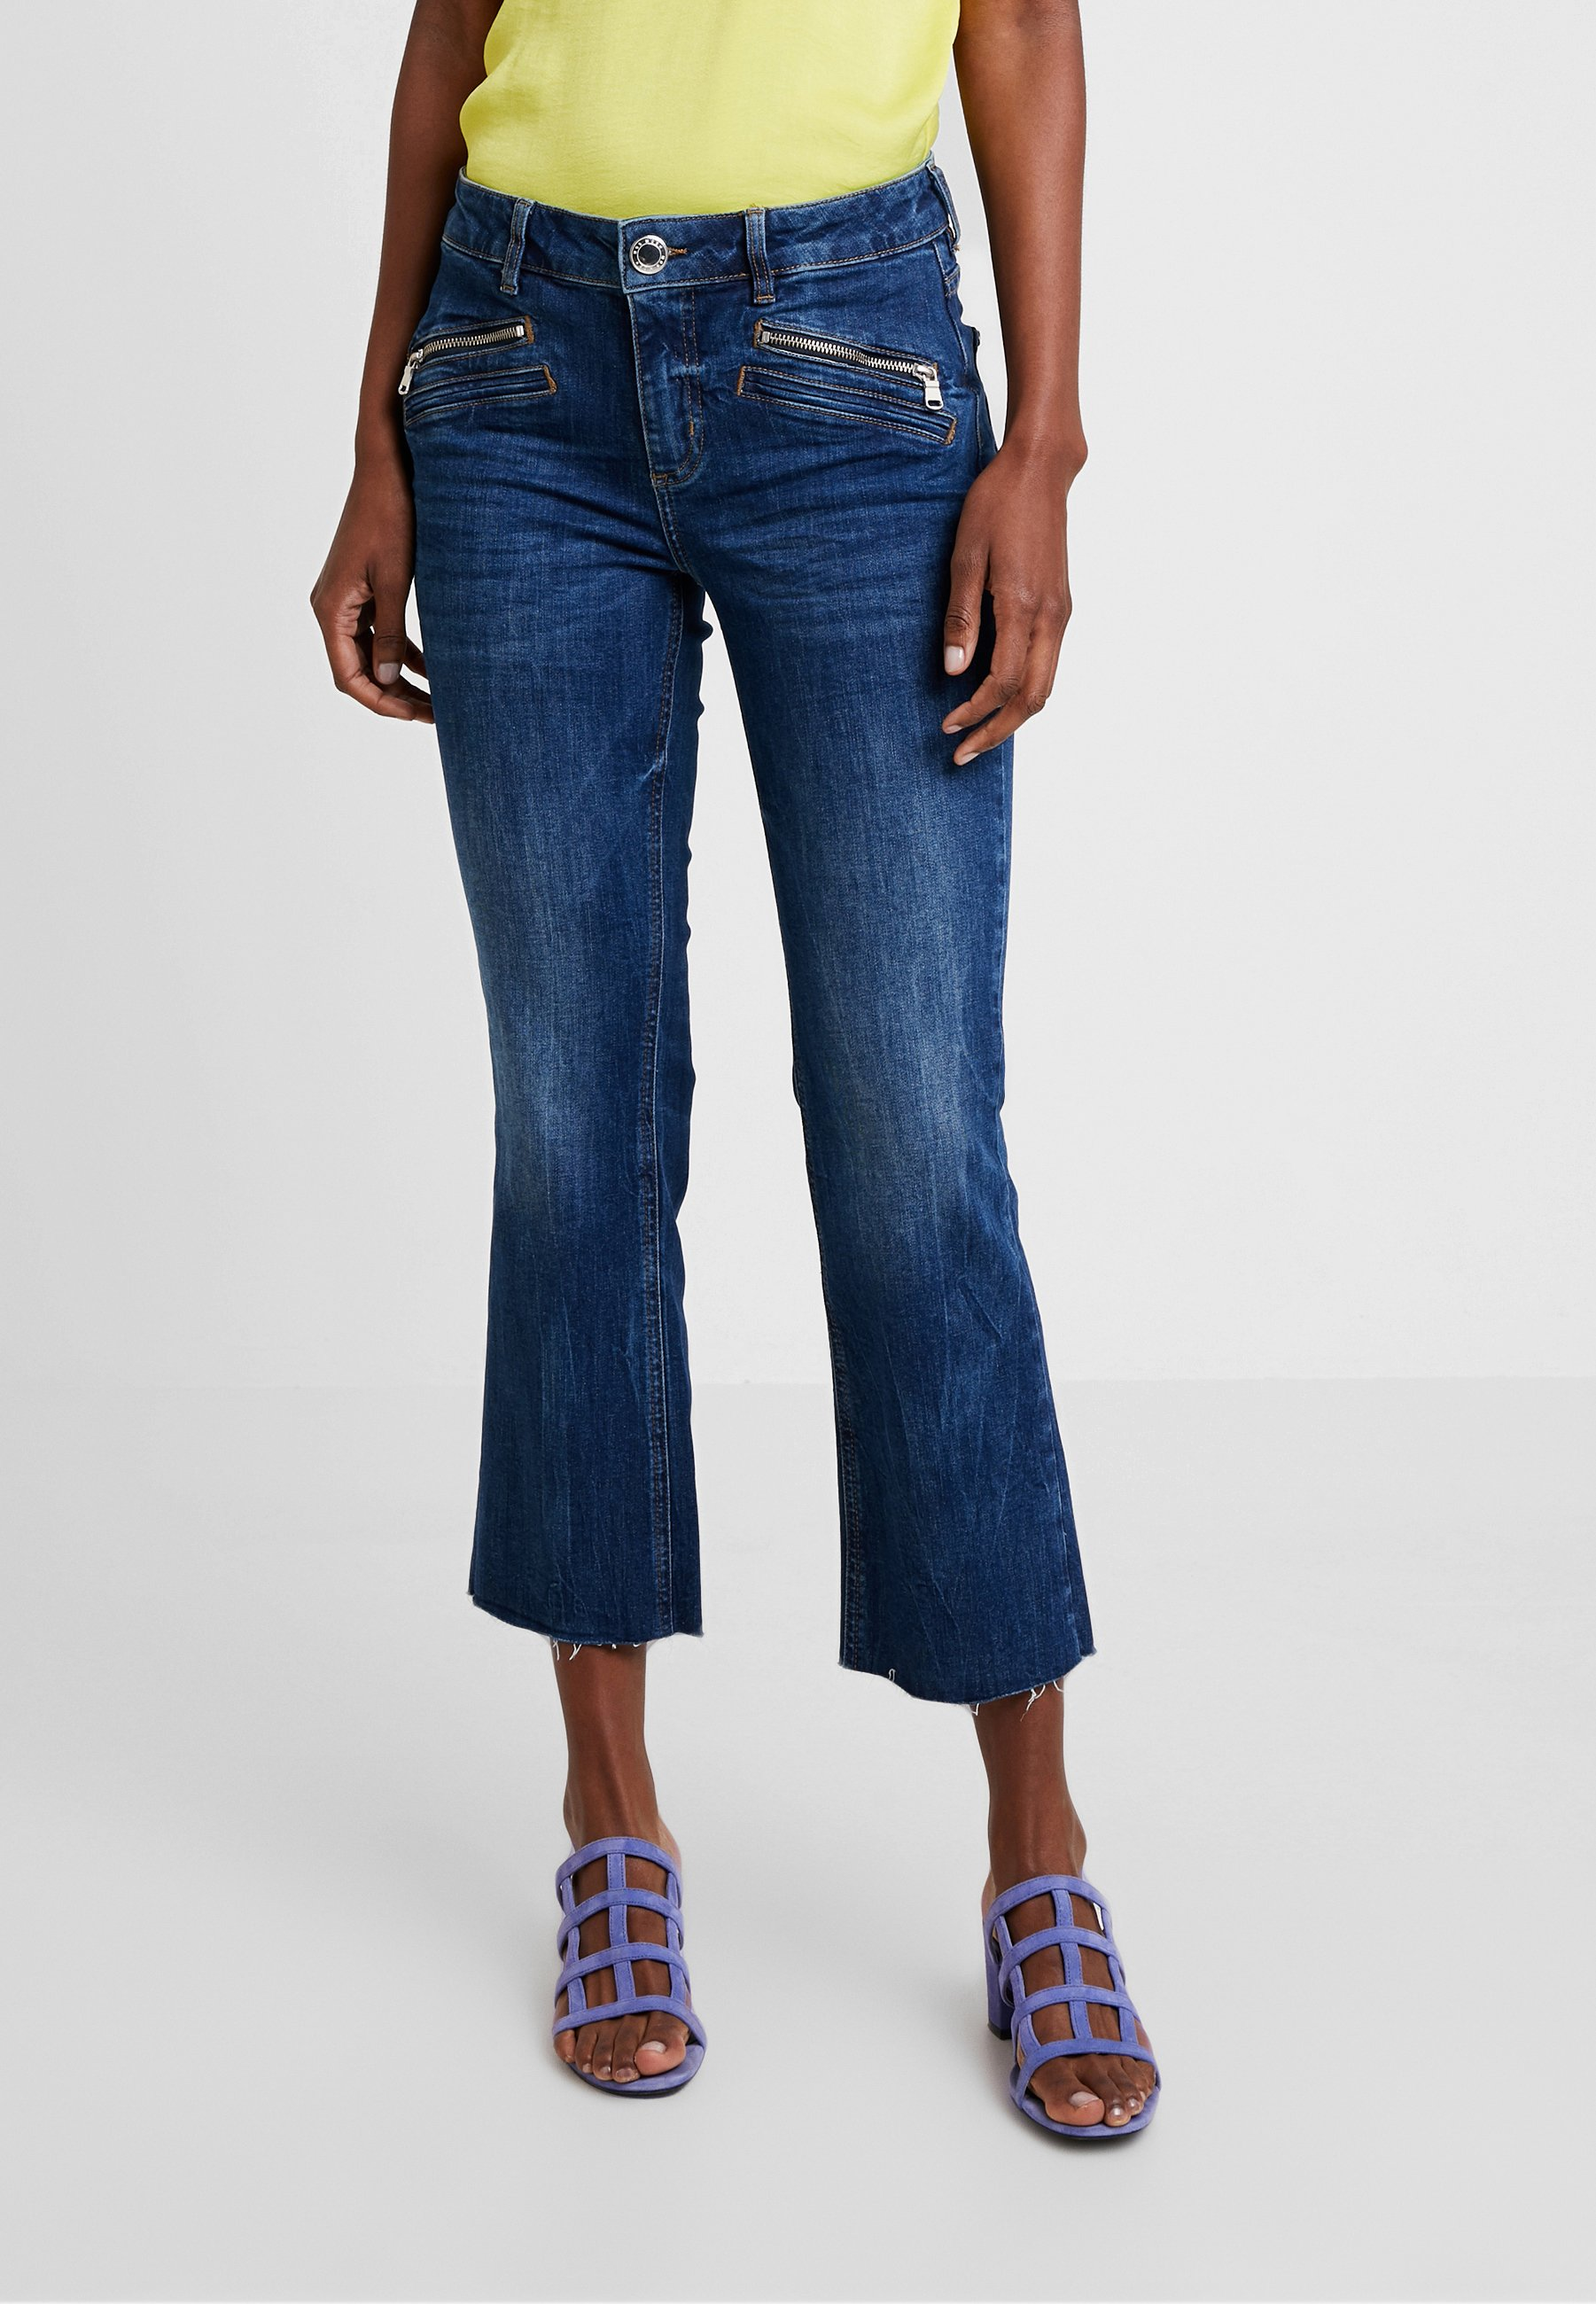 Mos Mosh SIMONE ZIP - Jeans bootcut blue denim